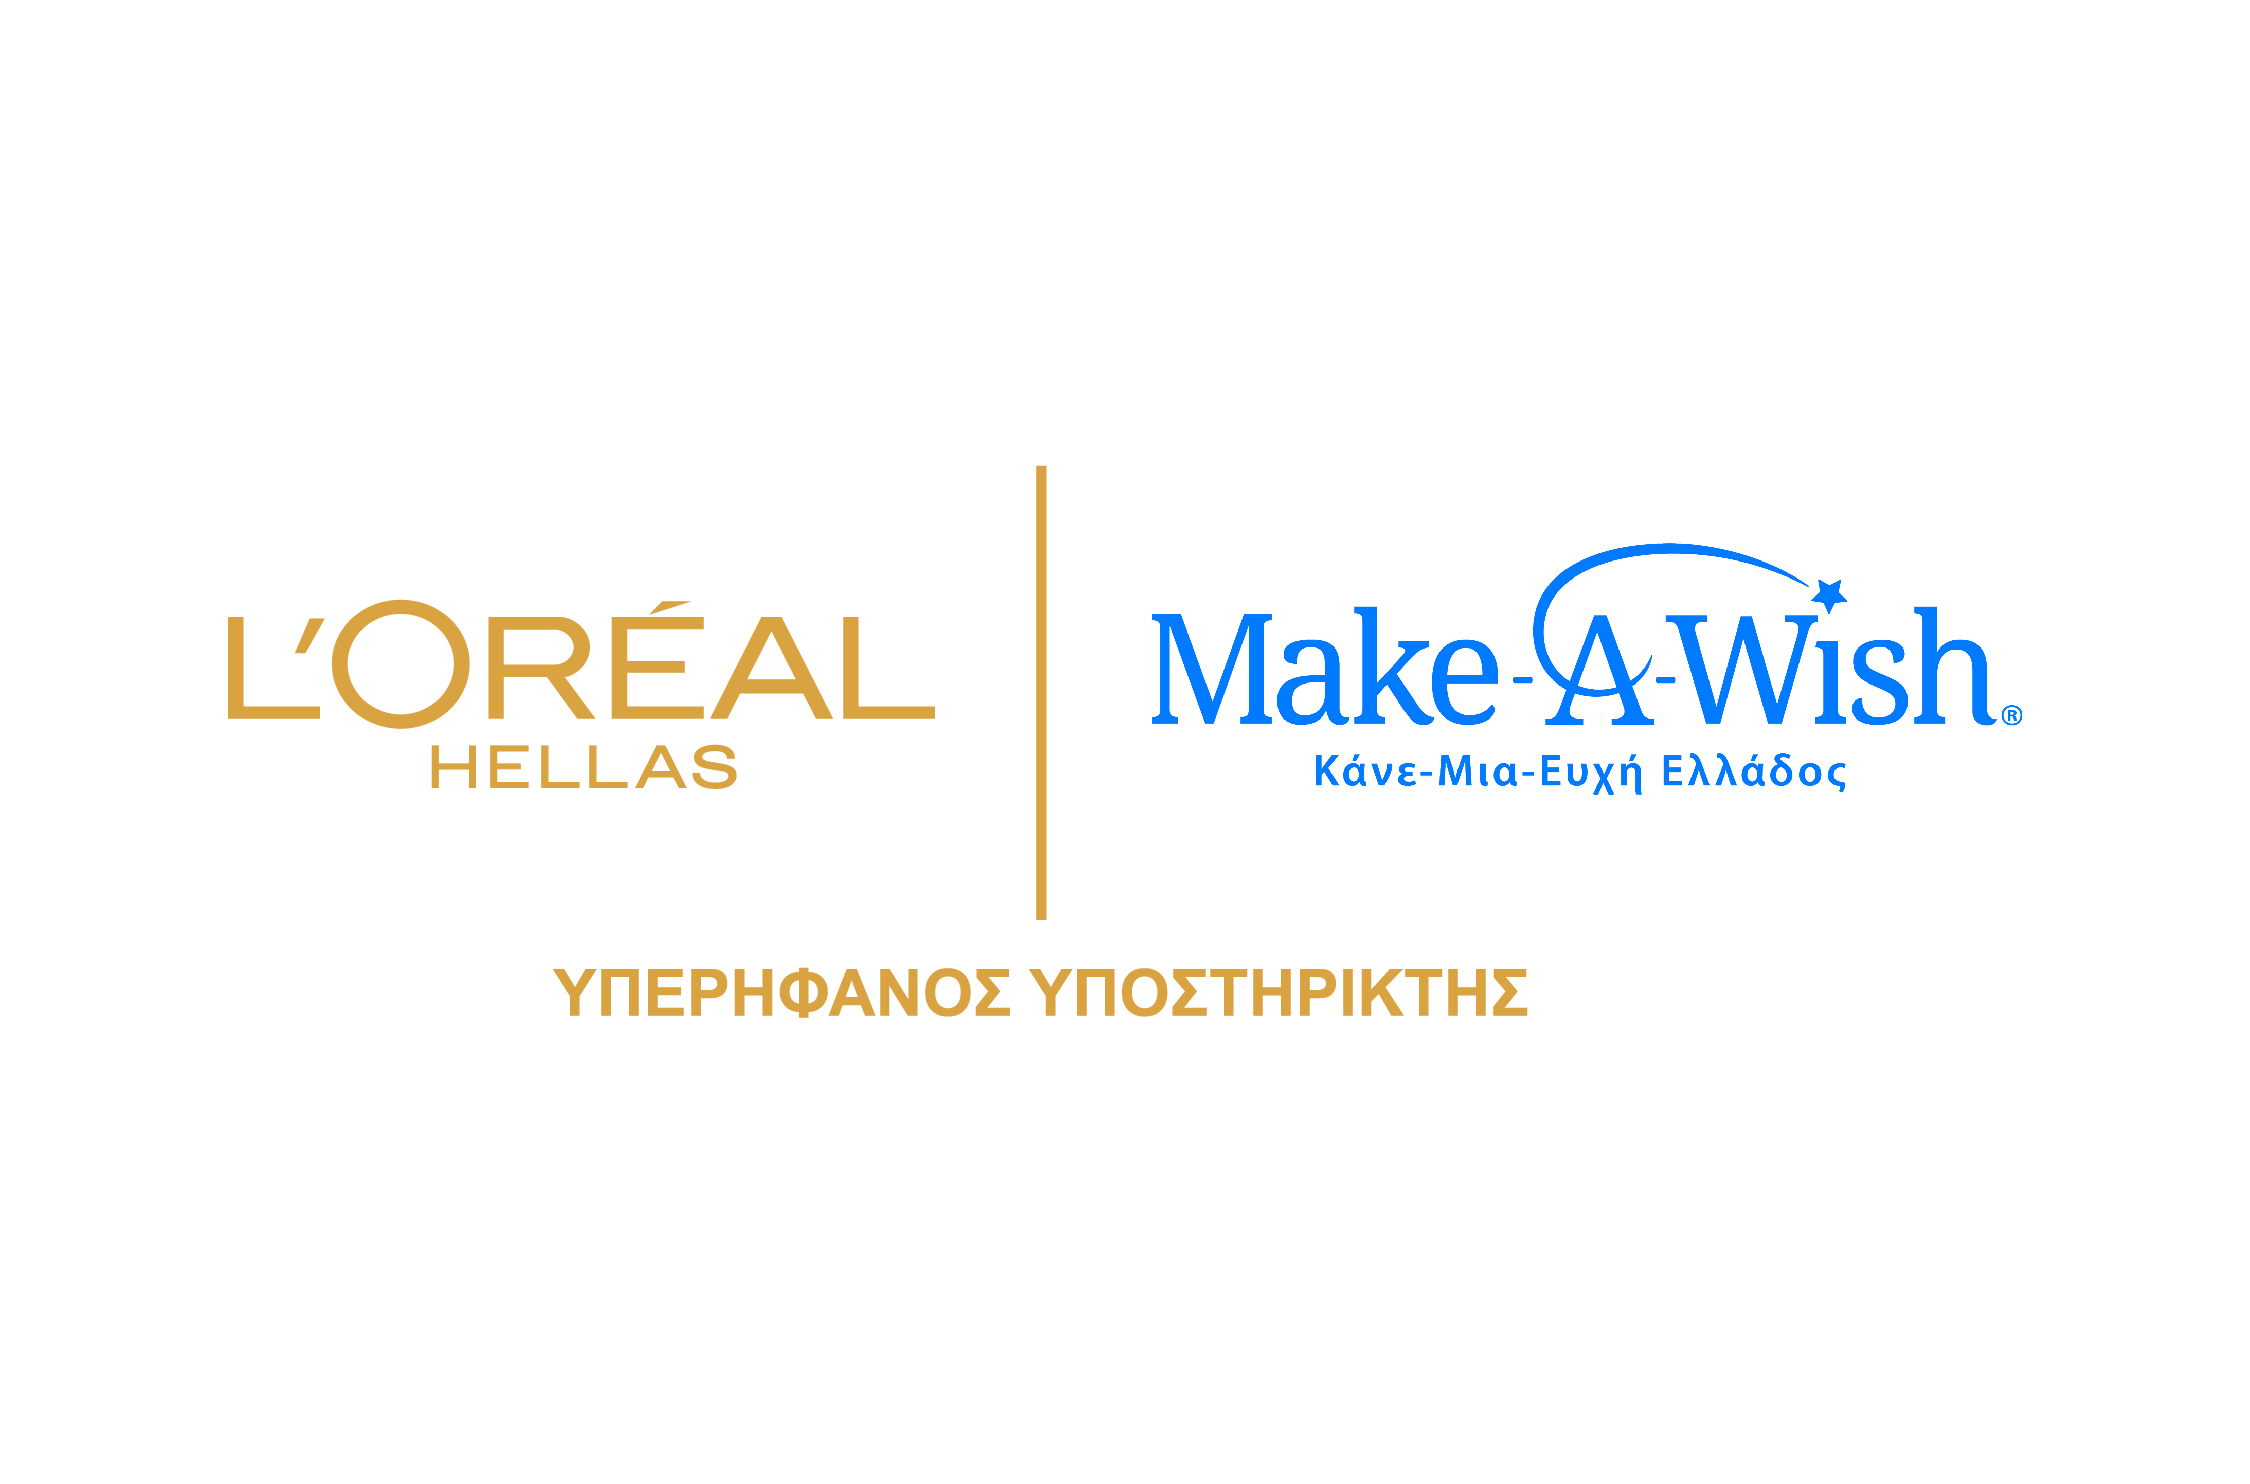 L'Oréal Hellas: Στηρίζει το Make A Wish Ελλάδος με σειρά ενεργειών